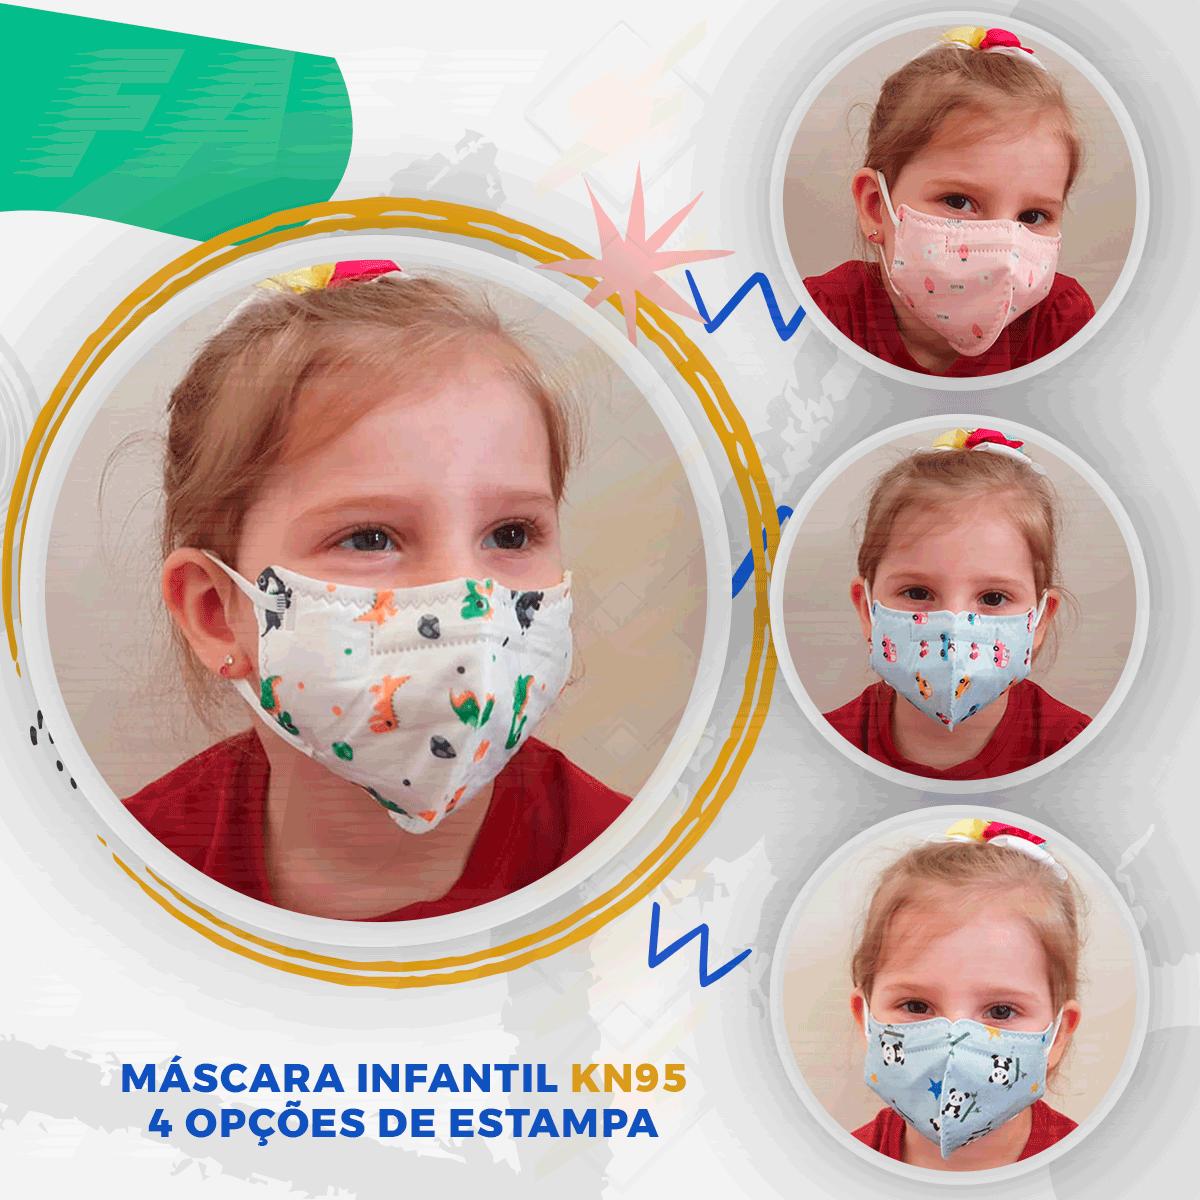 Máscaras Infantis Kids Kn95 Estampa de Dinossauro  10 Unidades  Jiada